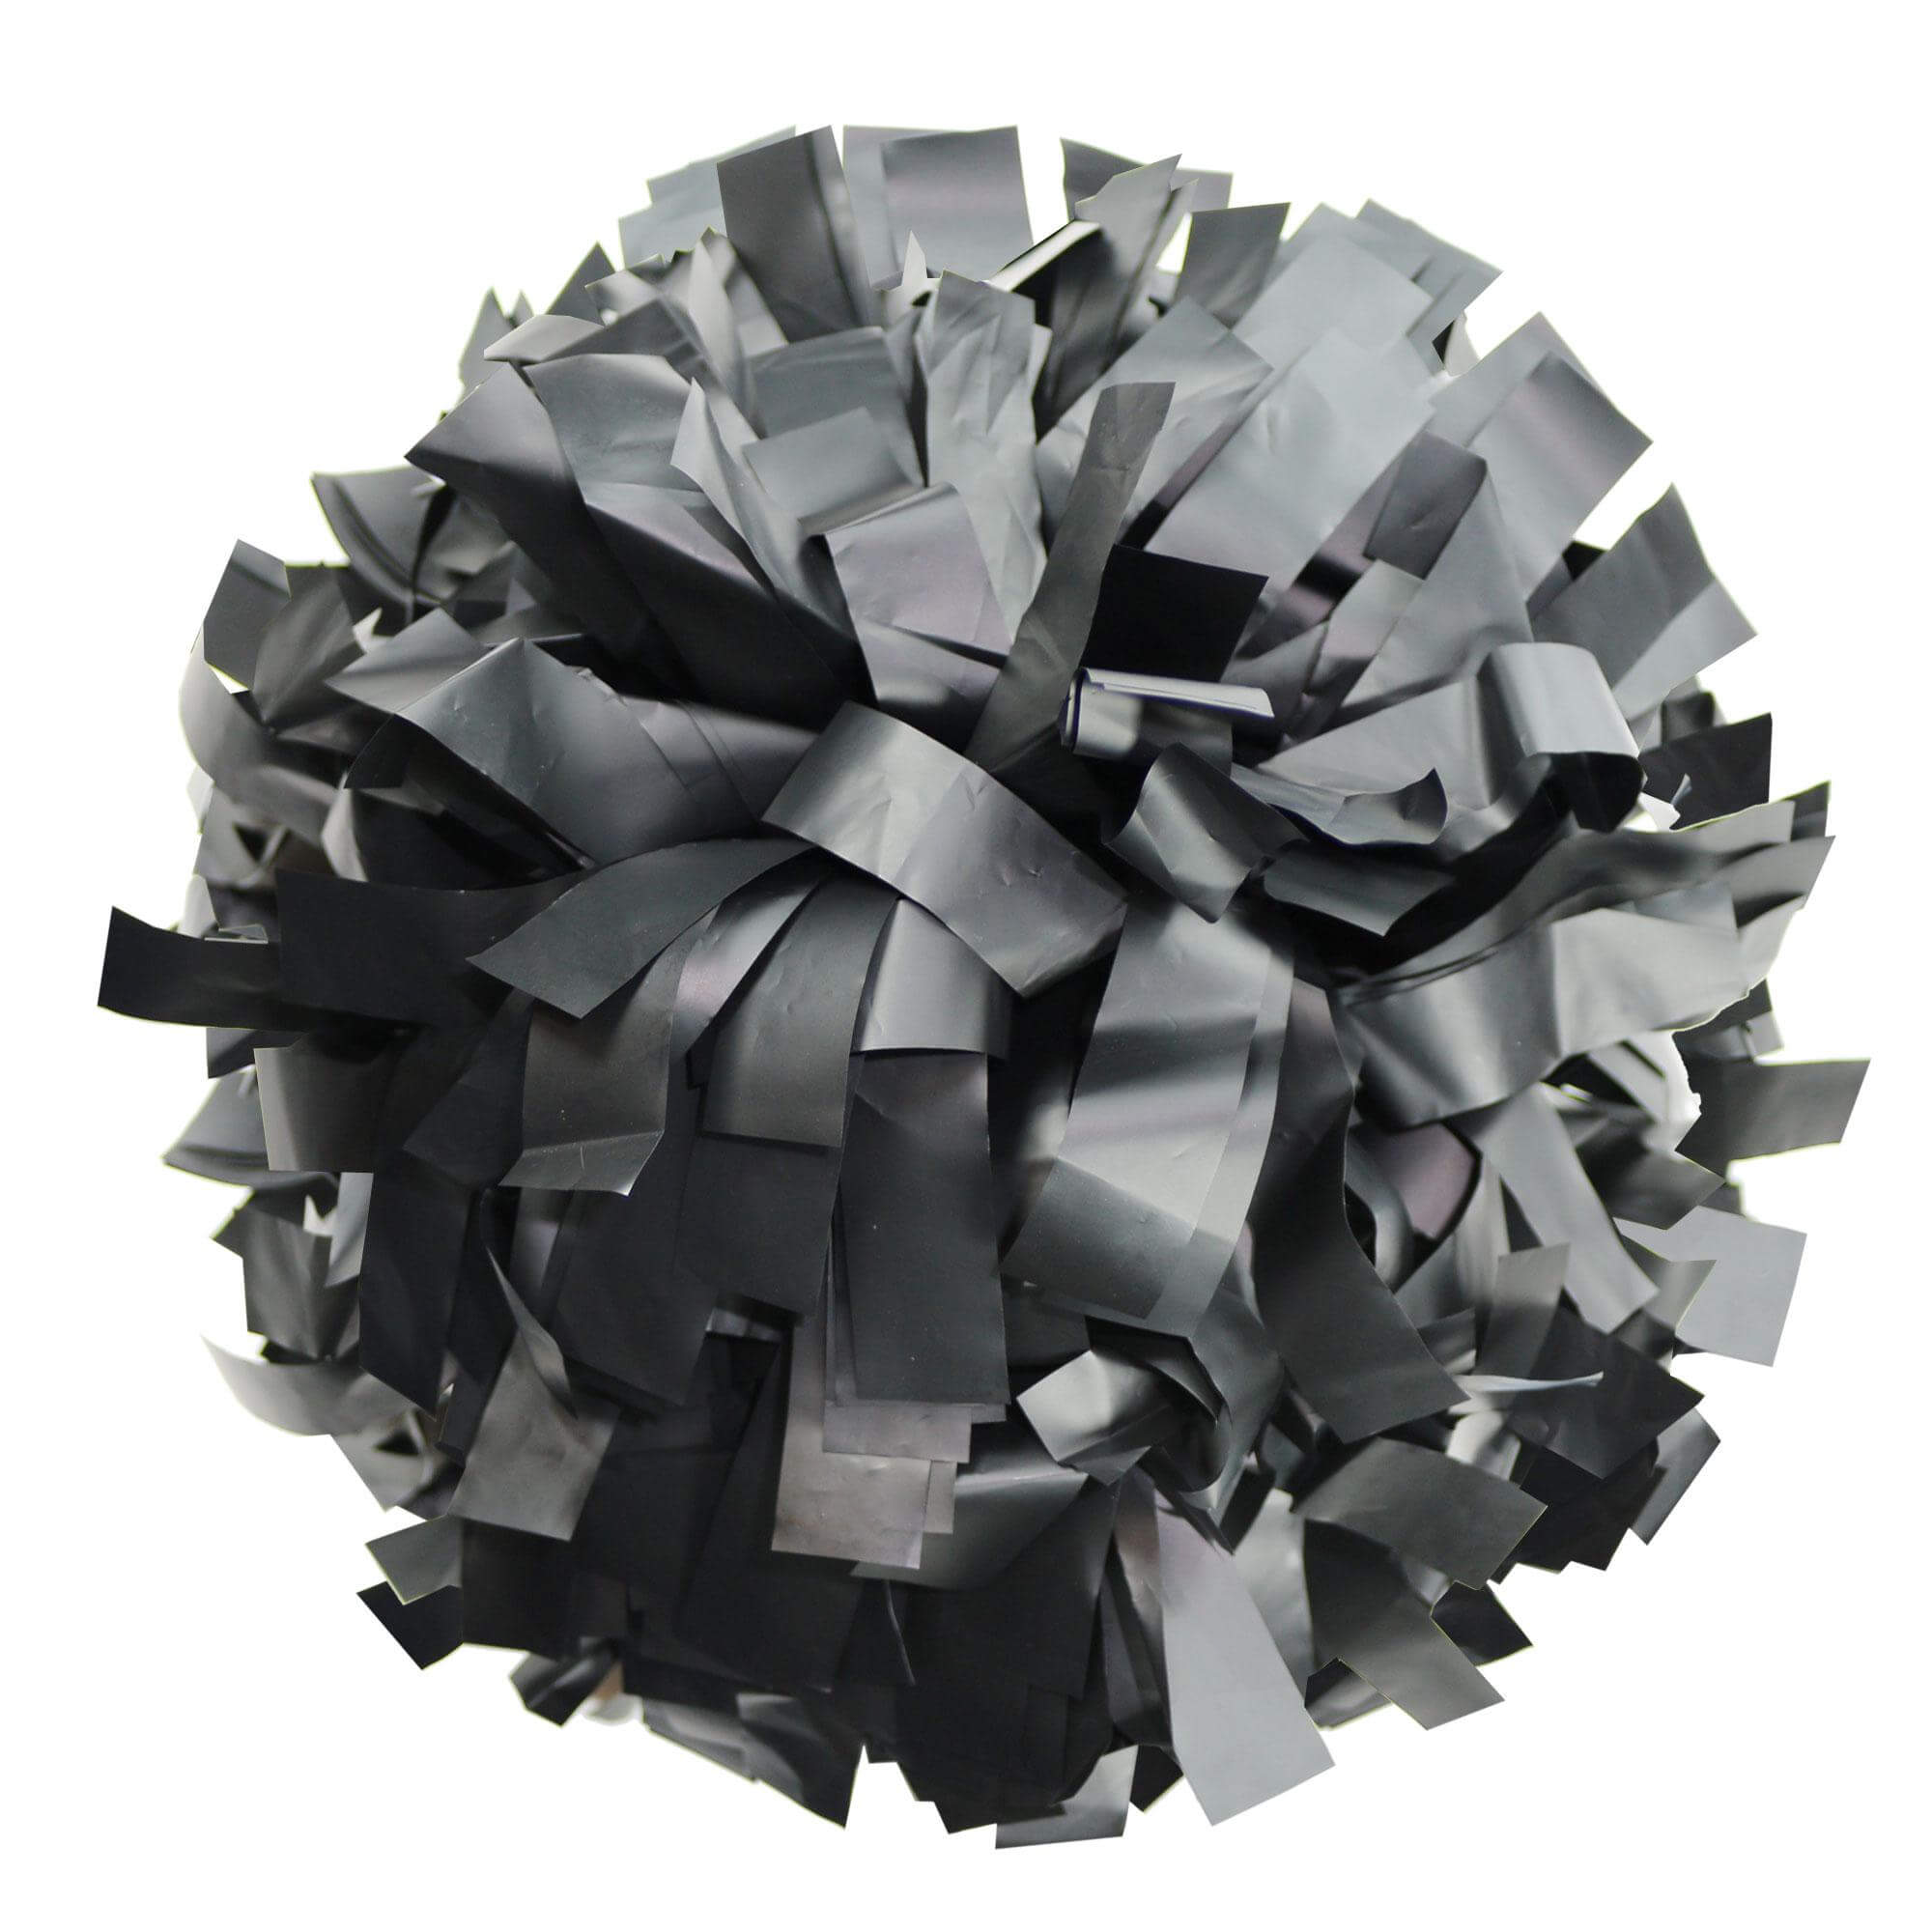 Danzcue Black Plastic Poms